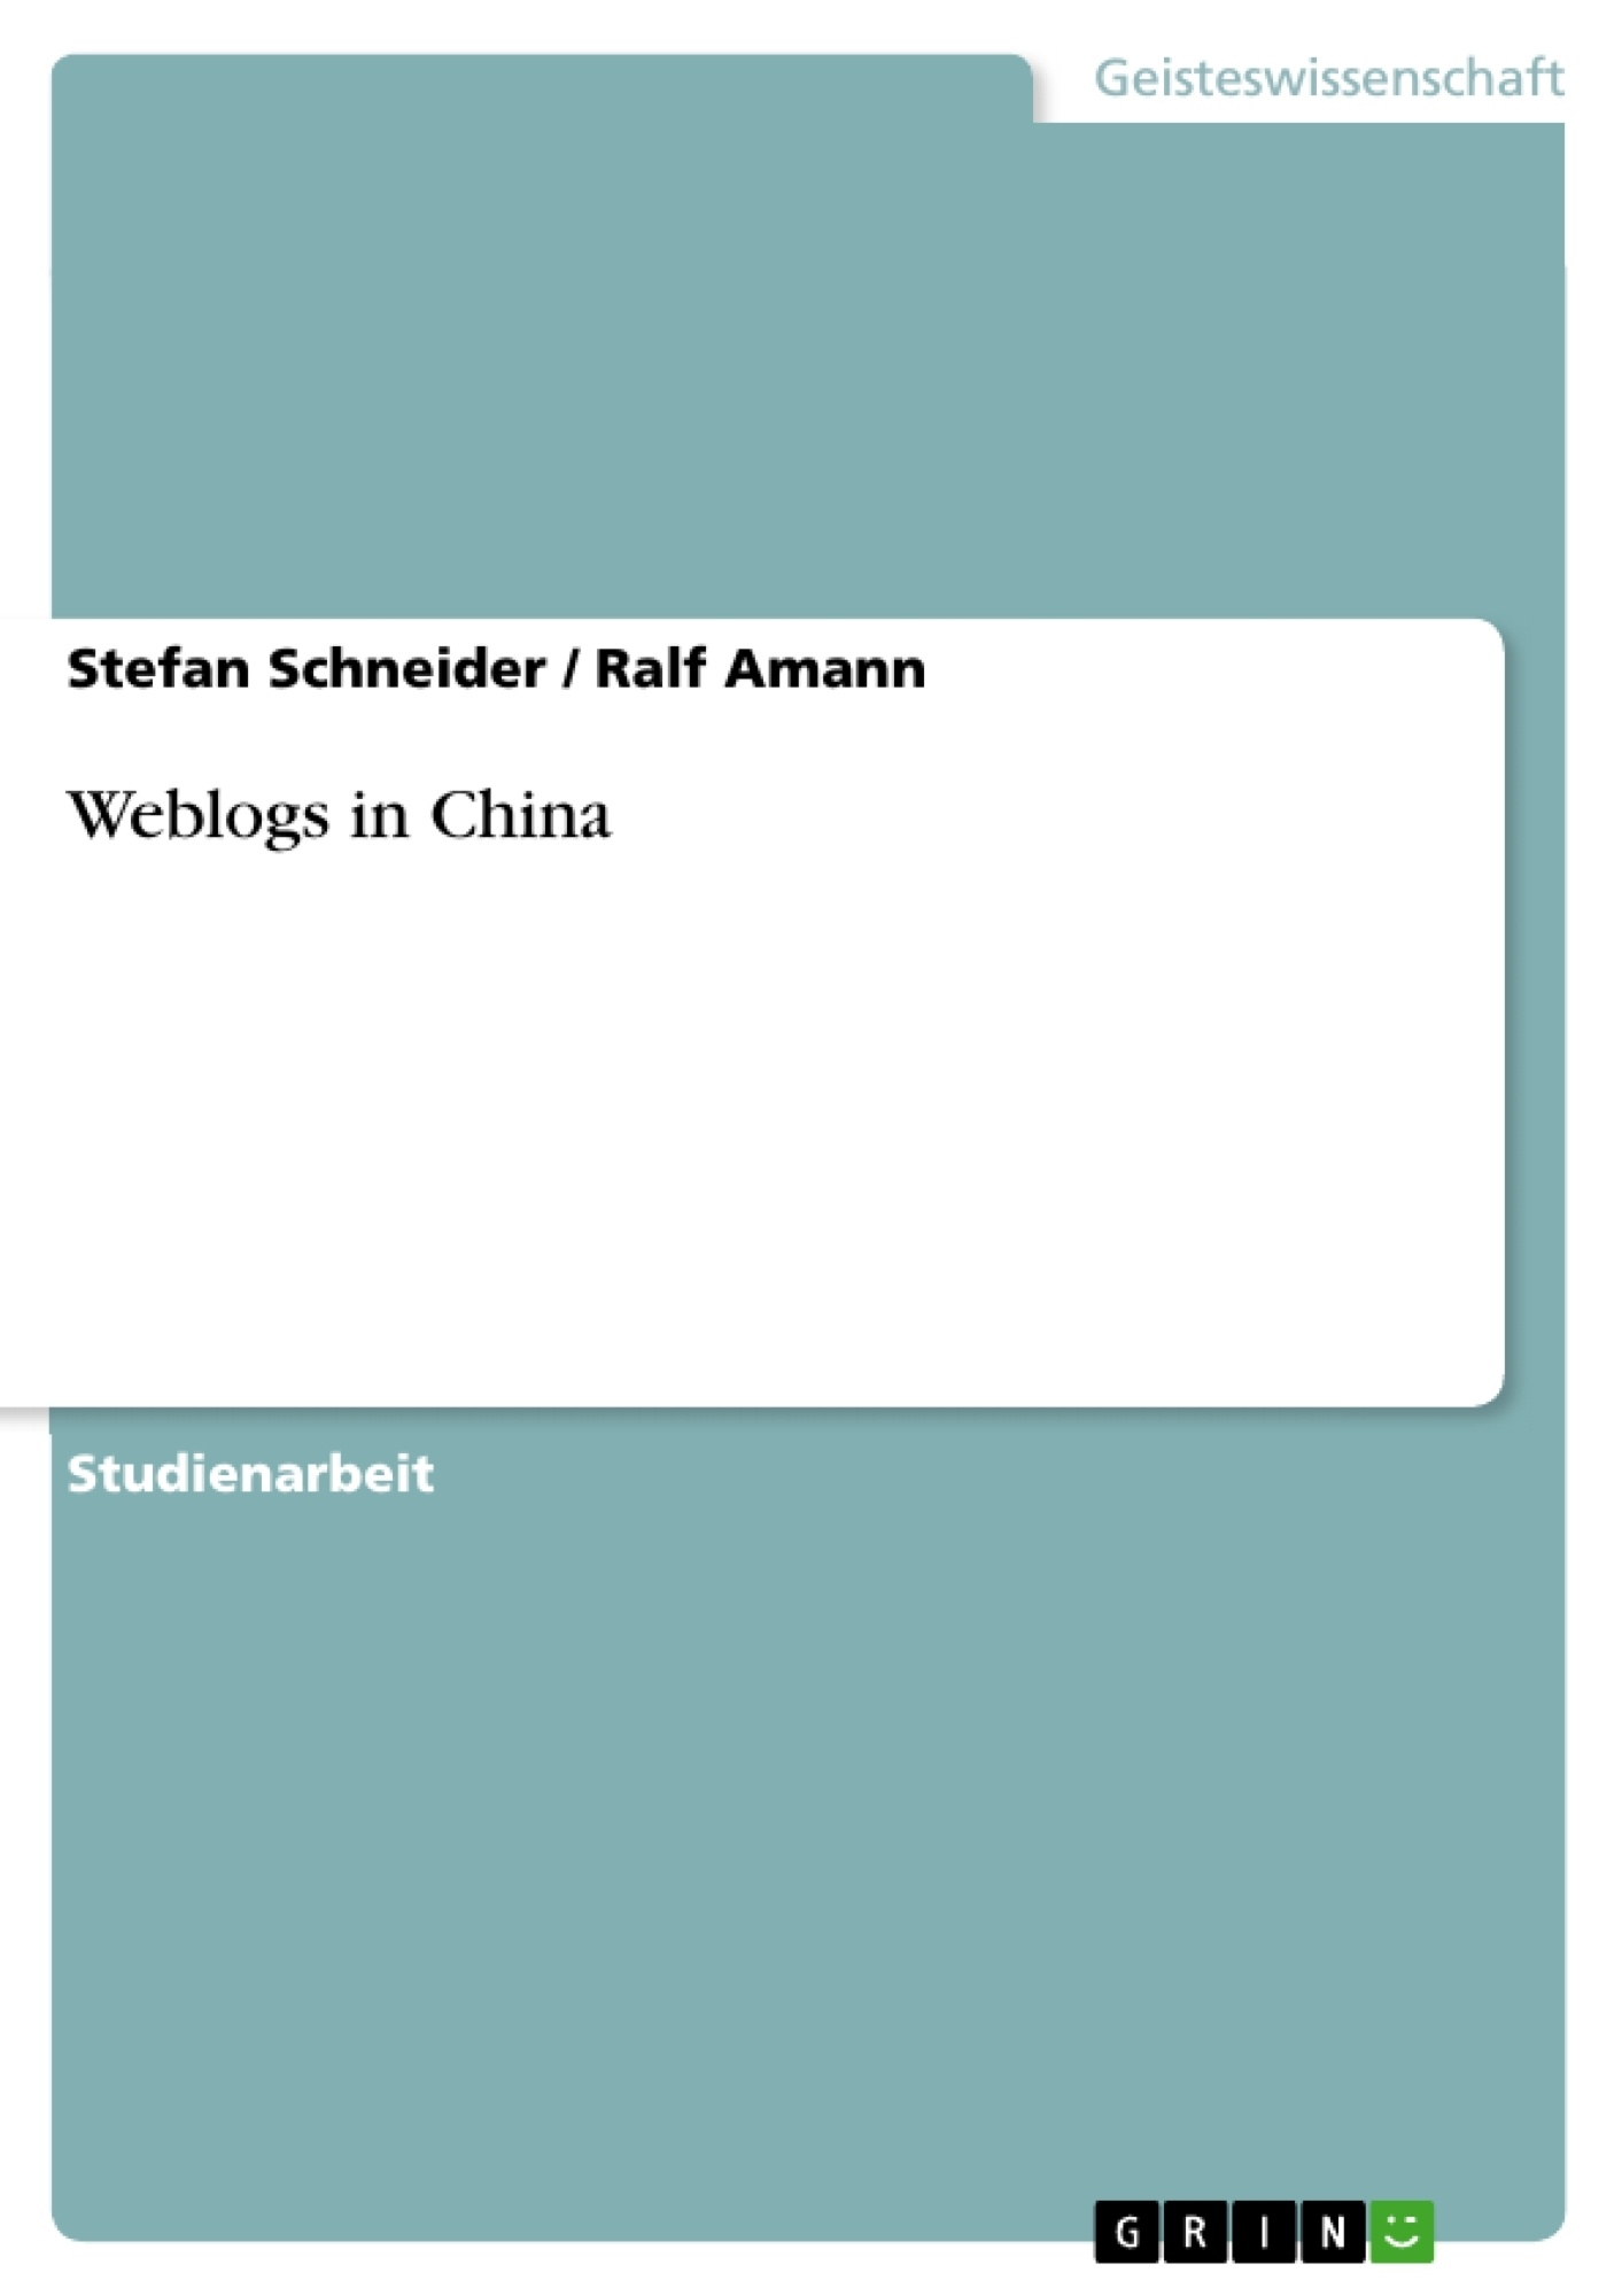 Titel: Weblogs in China